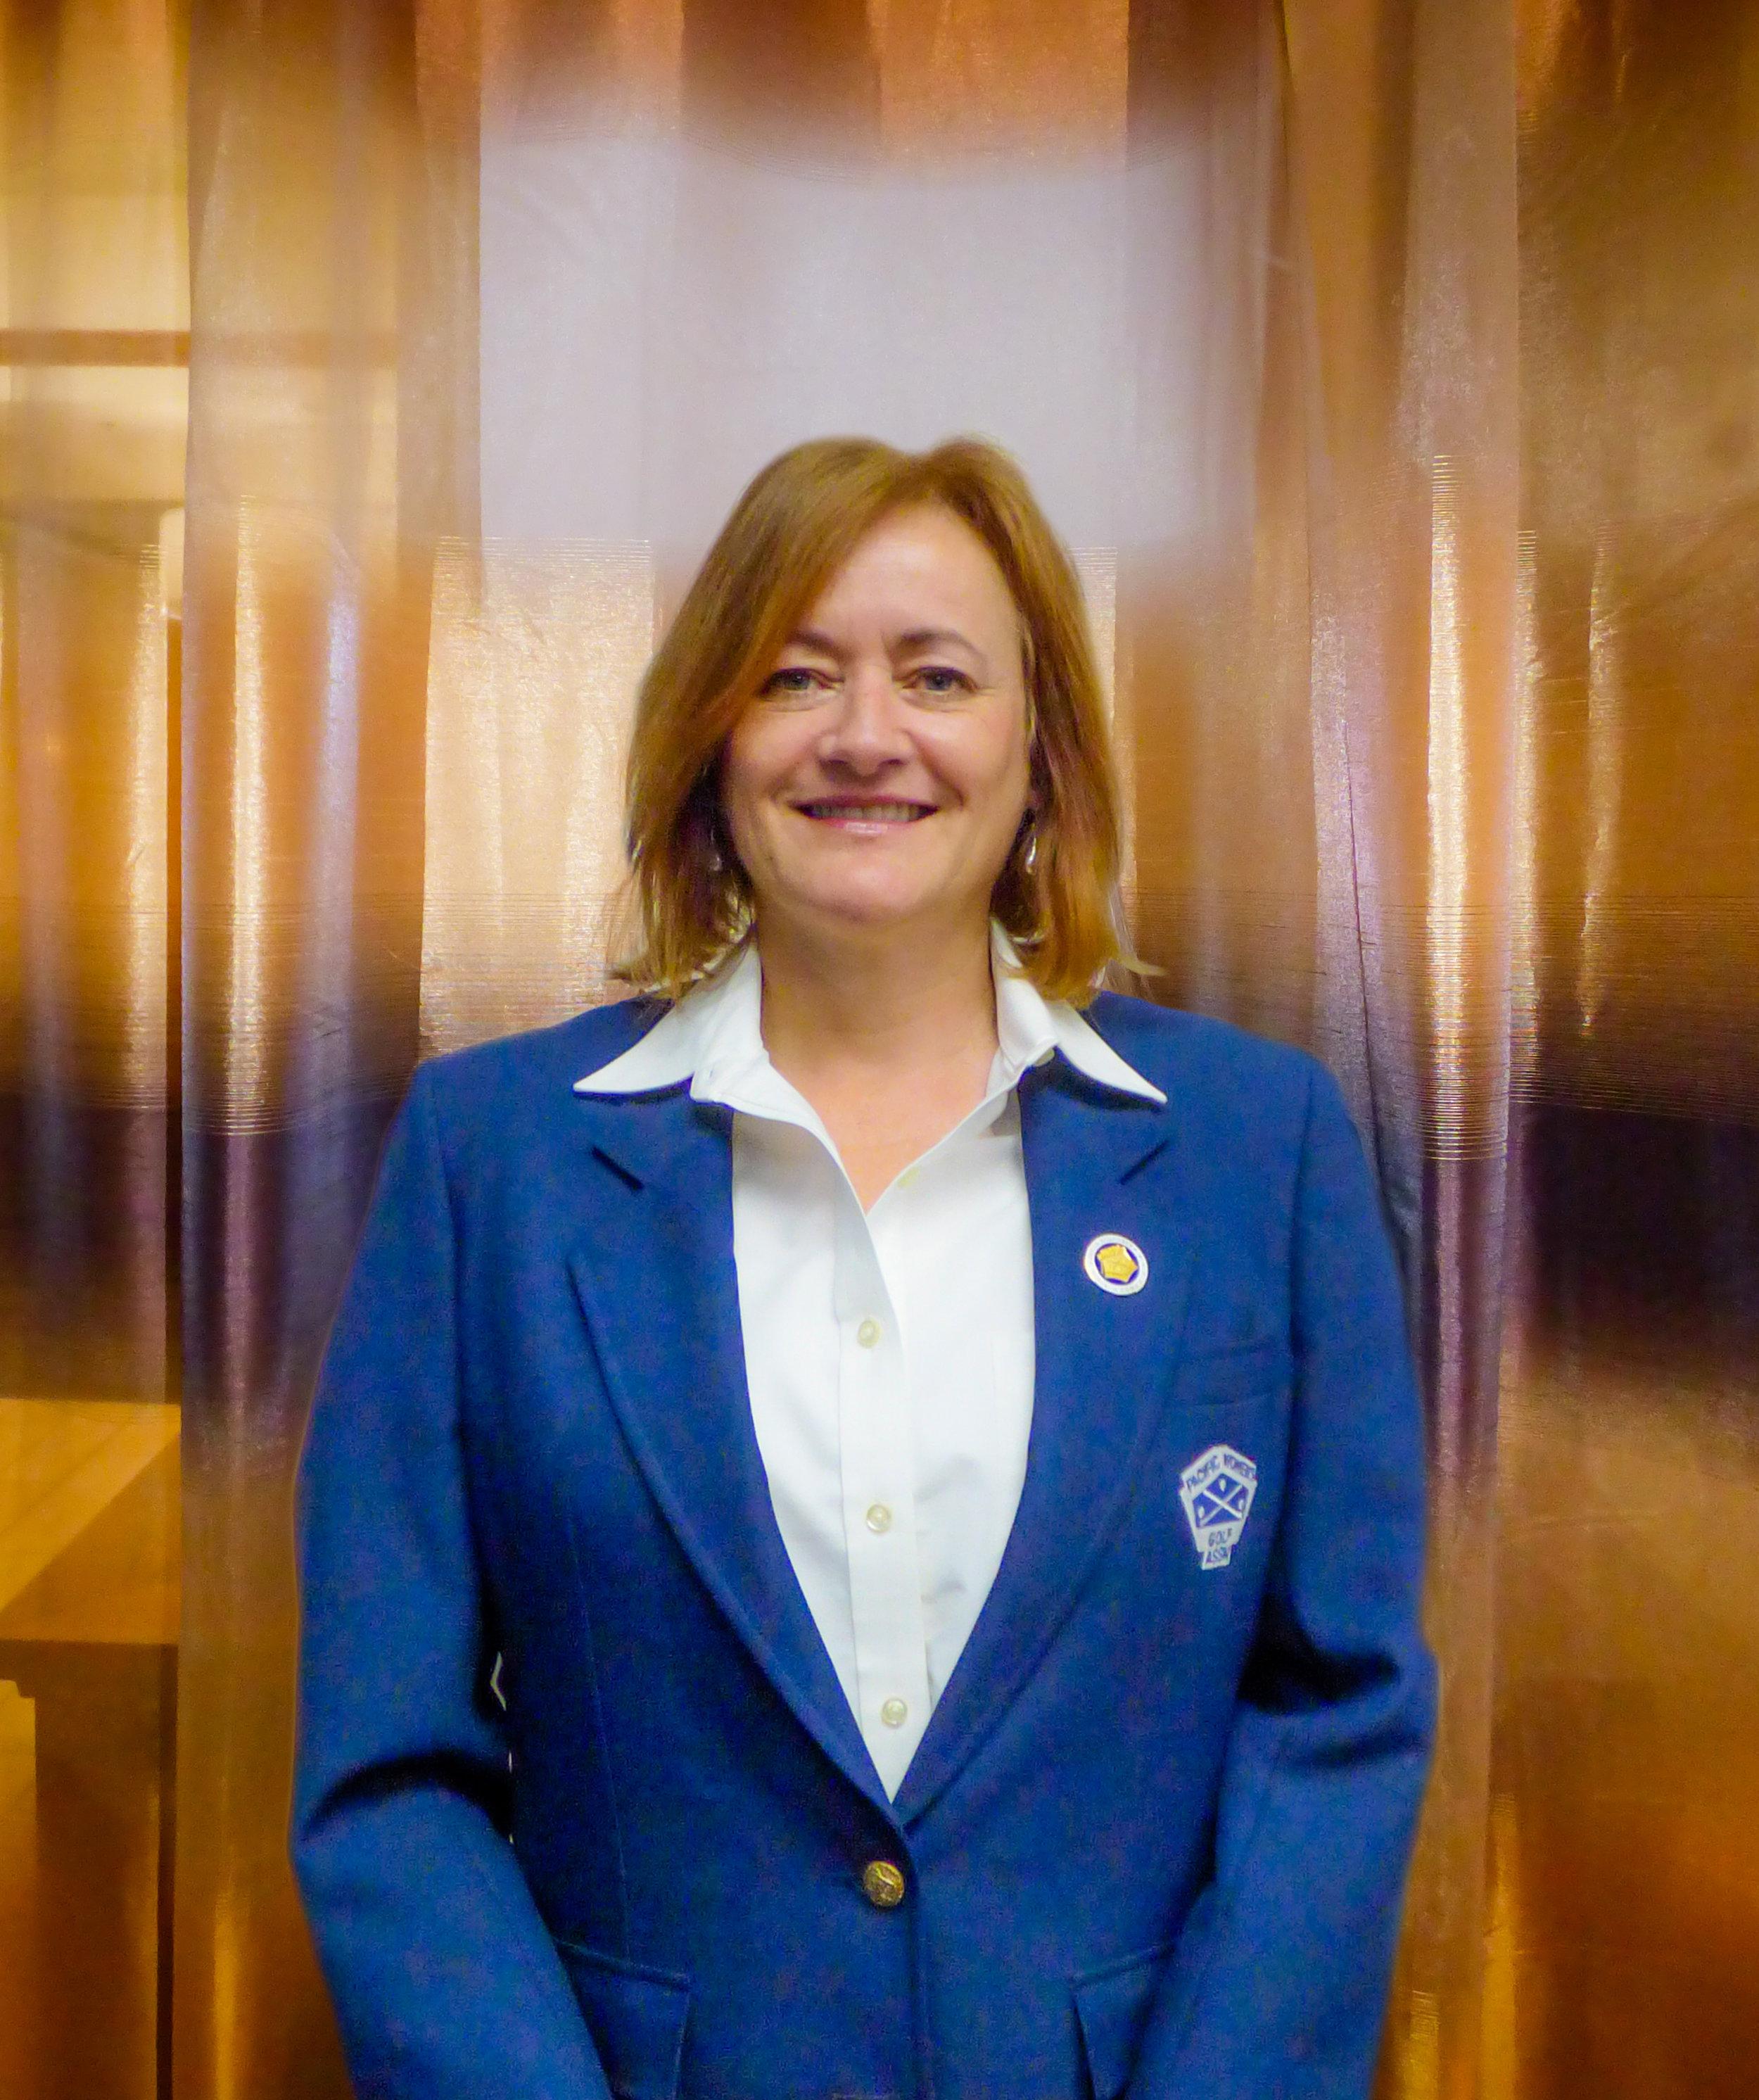 Caroline O'Brien, Executive Director